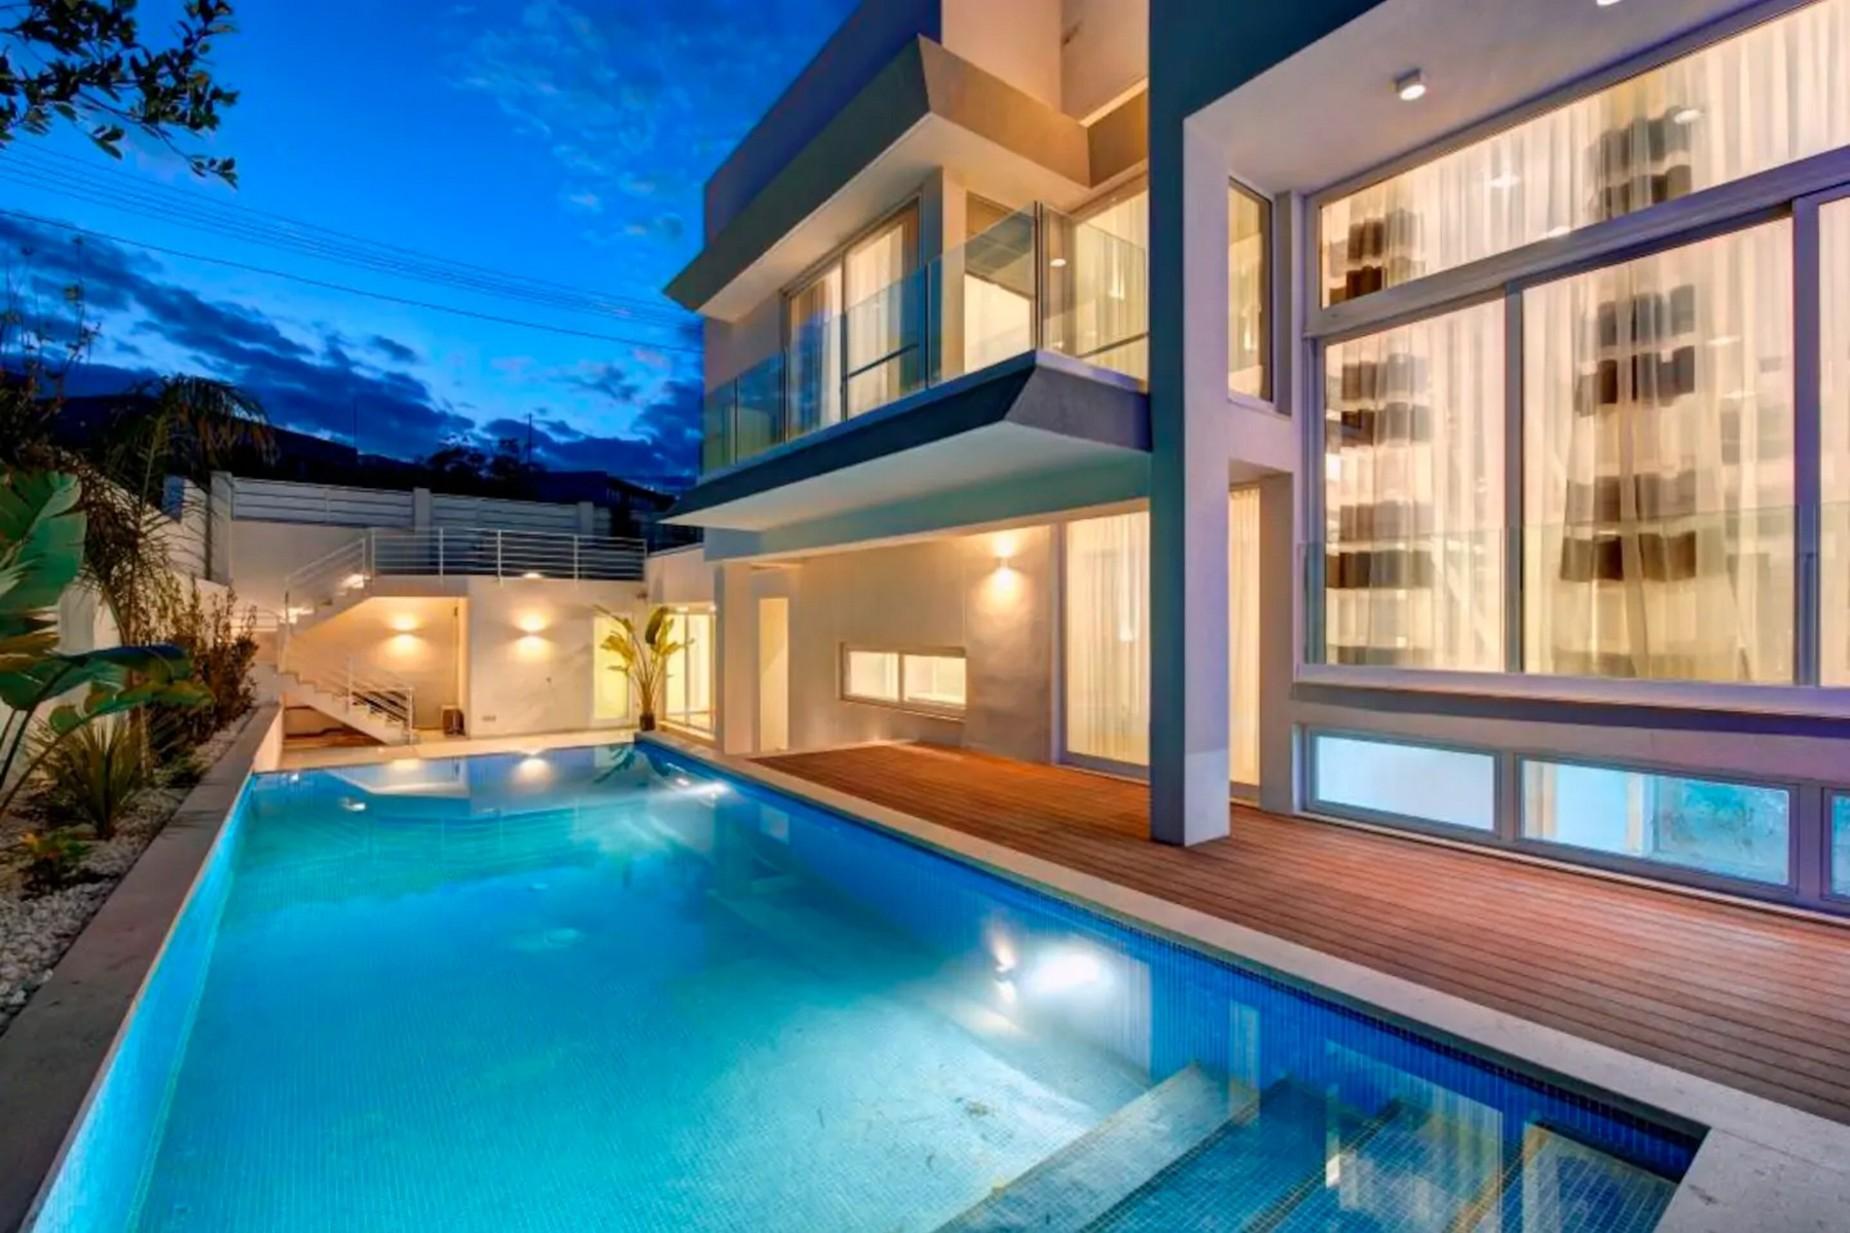 3 bed Villa For Rent in Iklin, Iklin - thumb 14